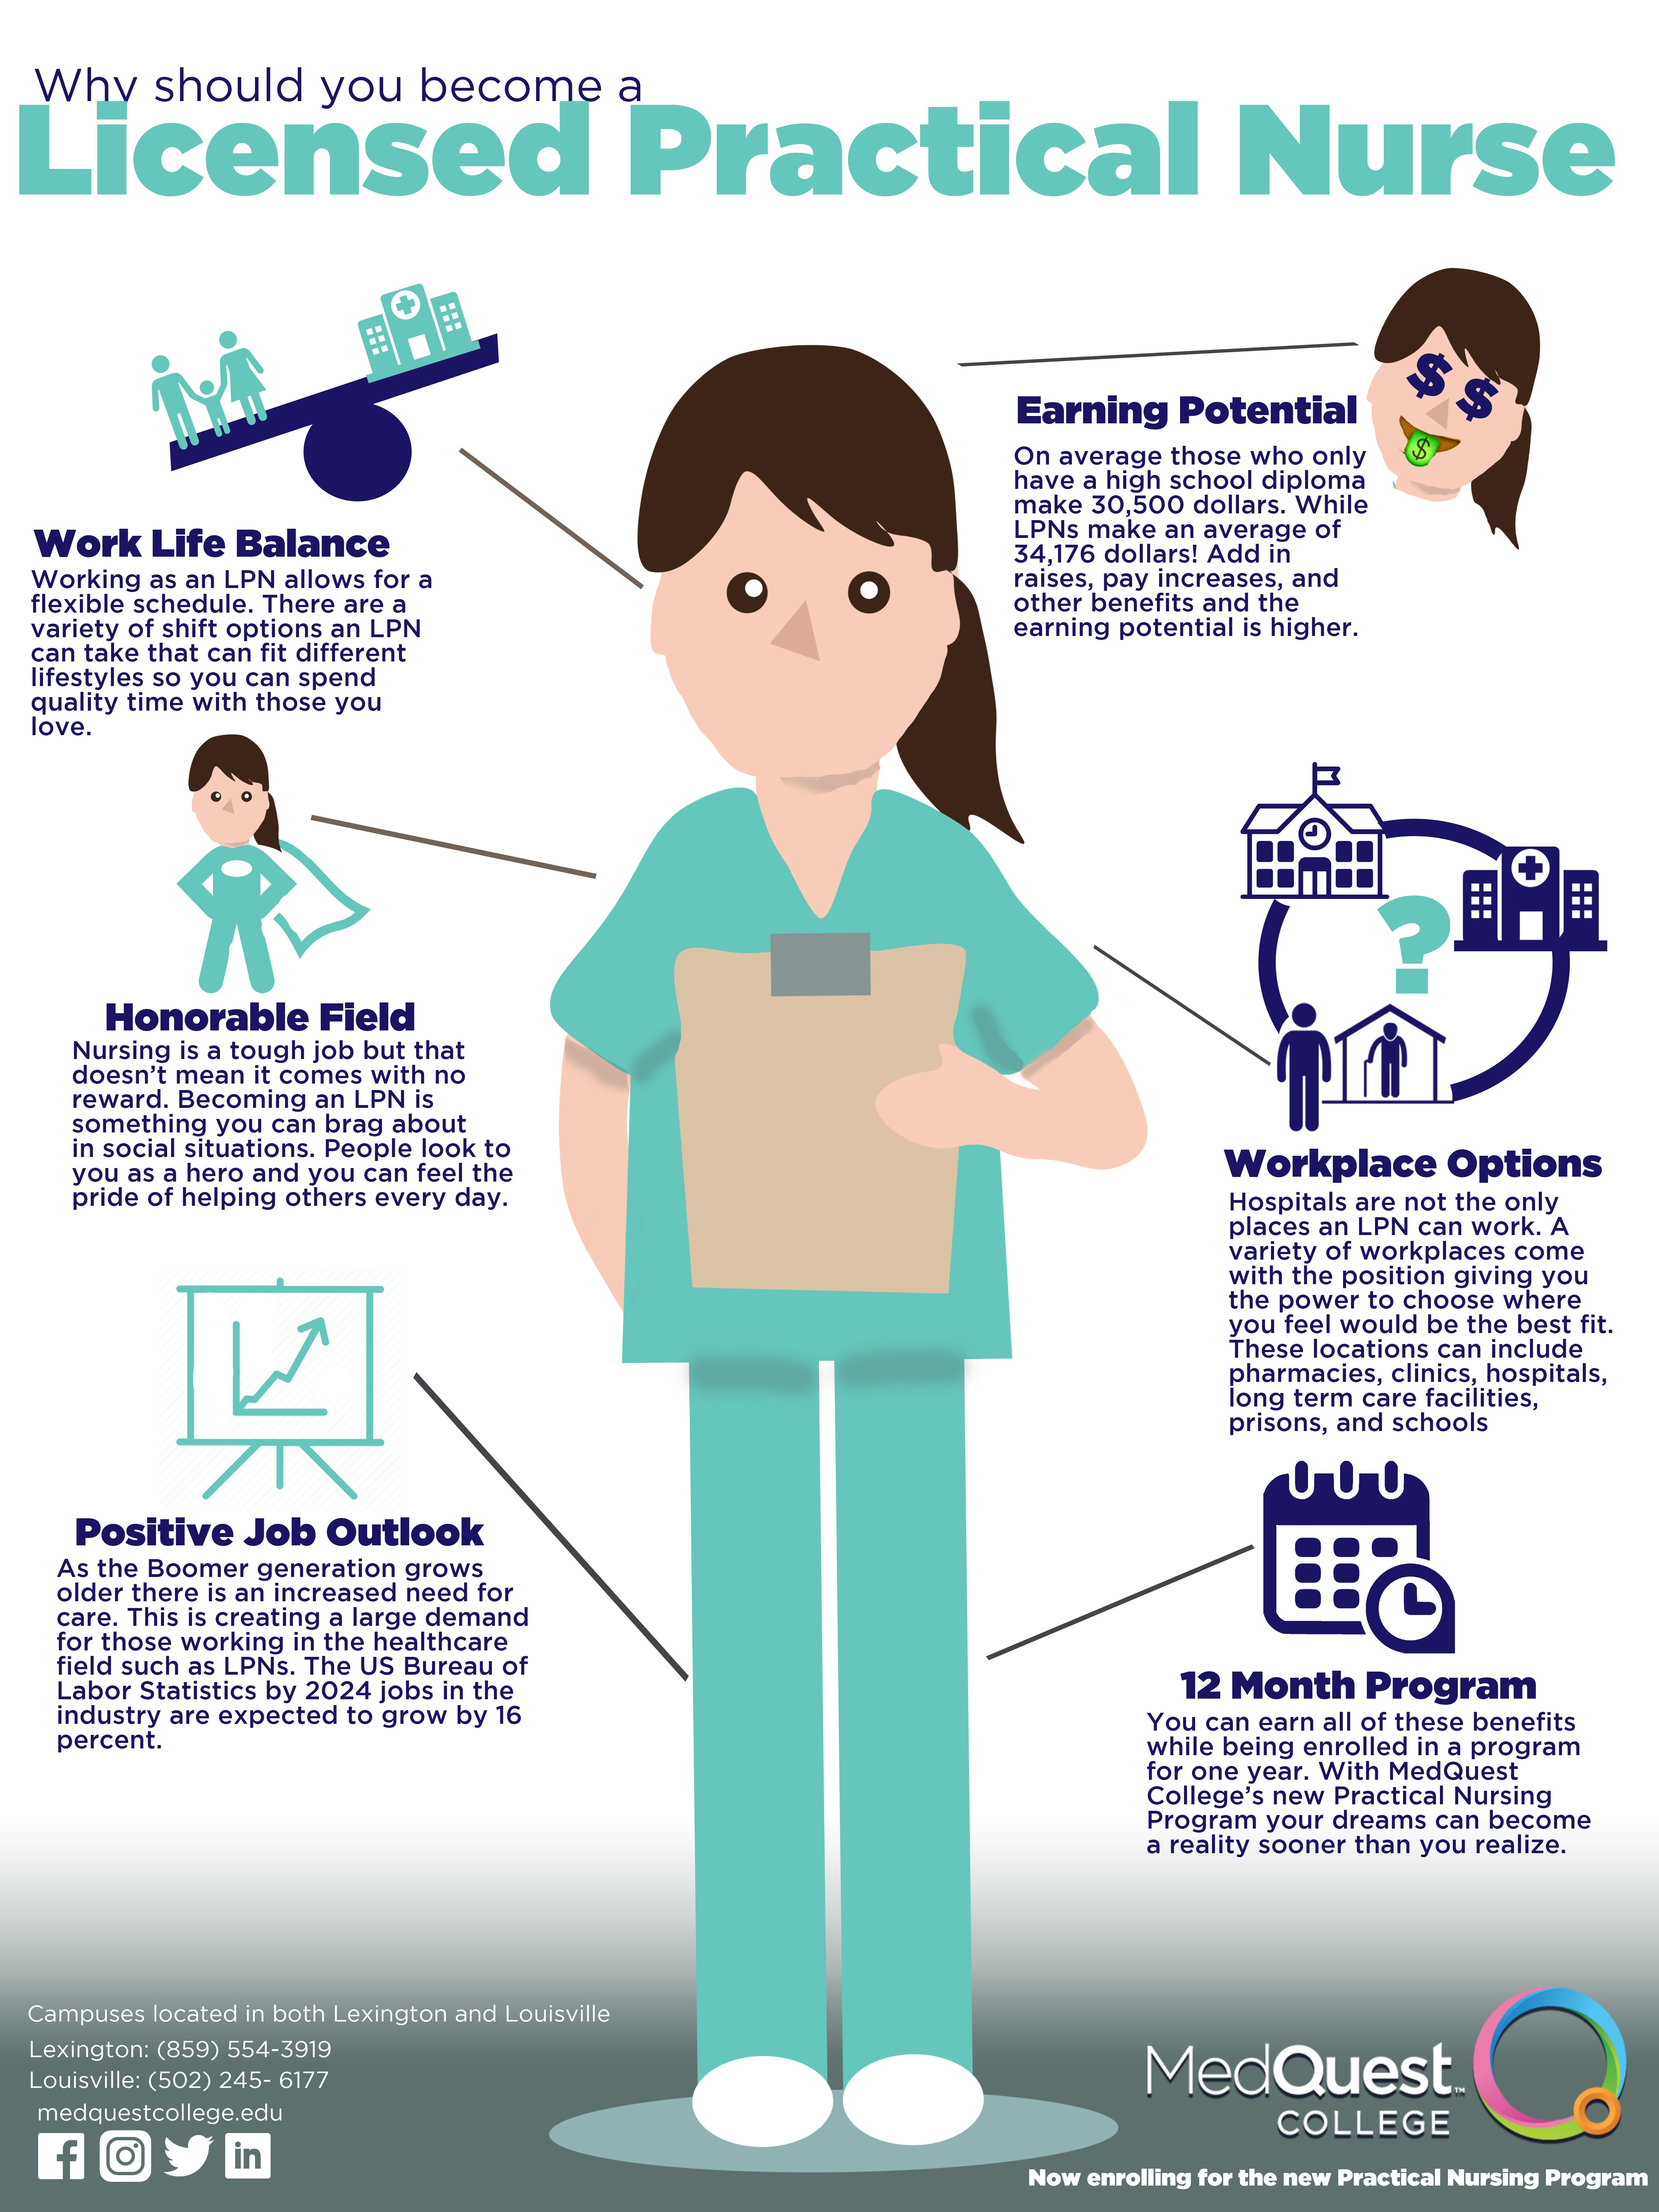 Practical Nursing Practical nursing, Nursing license